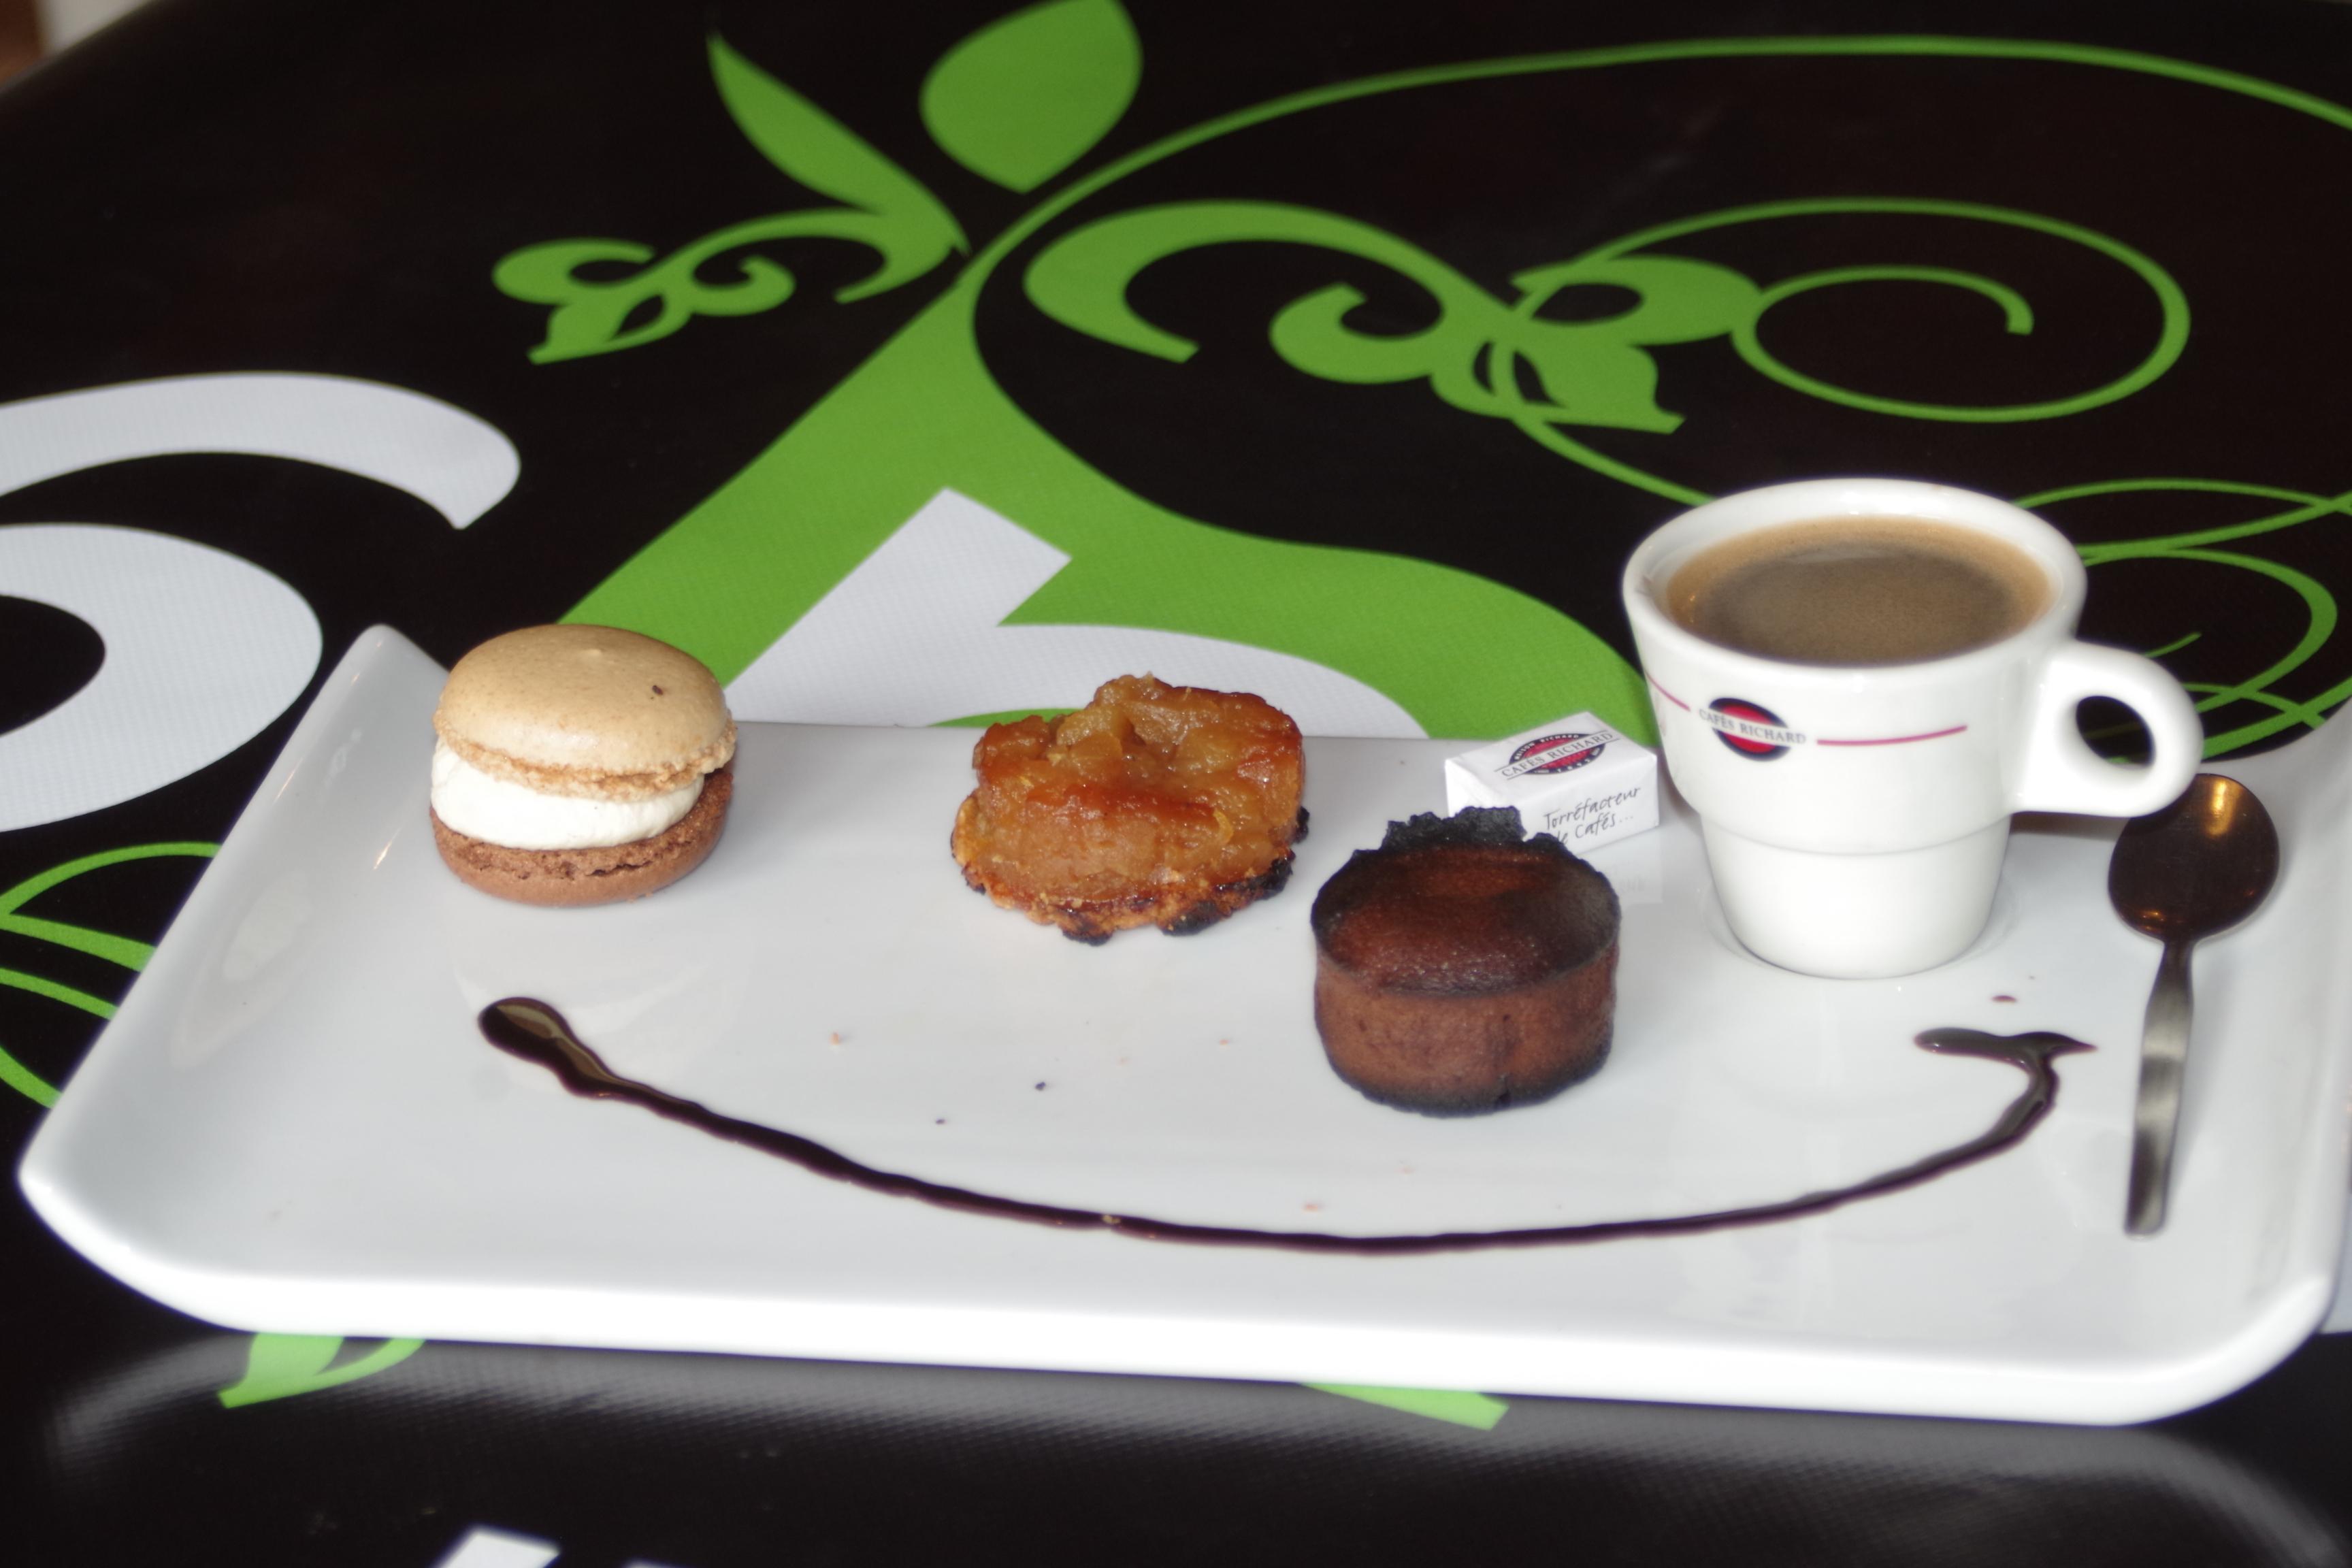 Mercredi 2 novembre Caf%C3%A9-gourmand